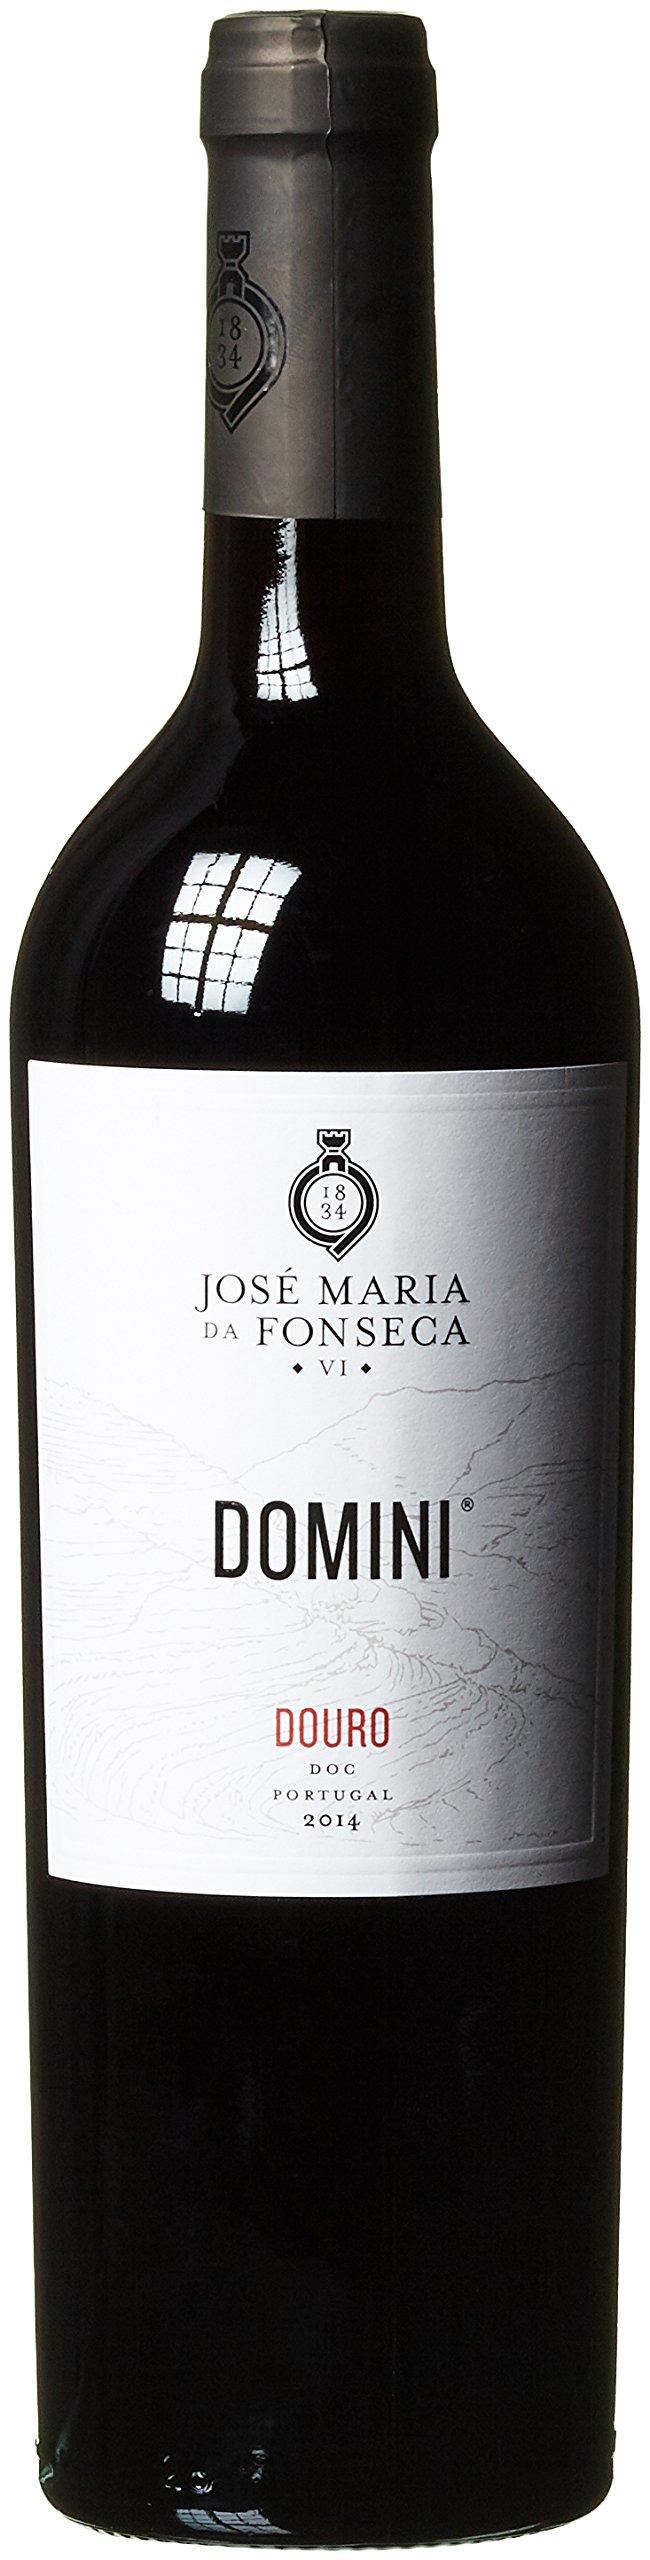 Jose-Maria-da-Fonseca-Domini-trocken-1-x-075-l